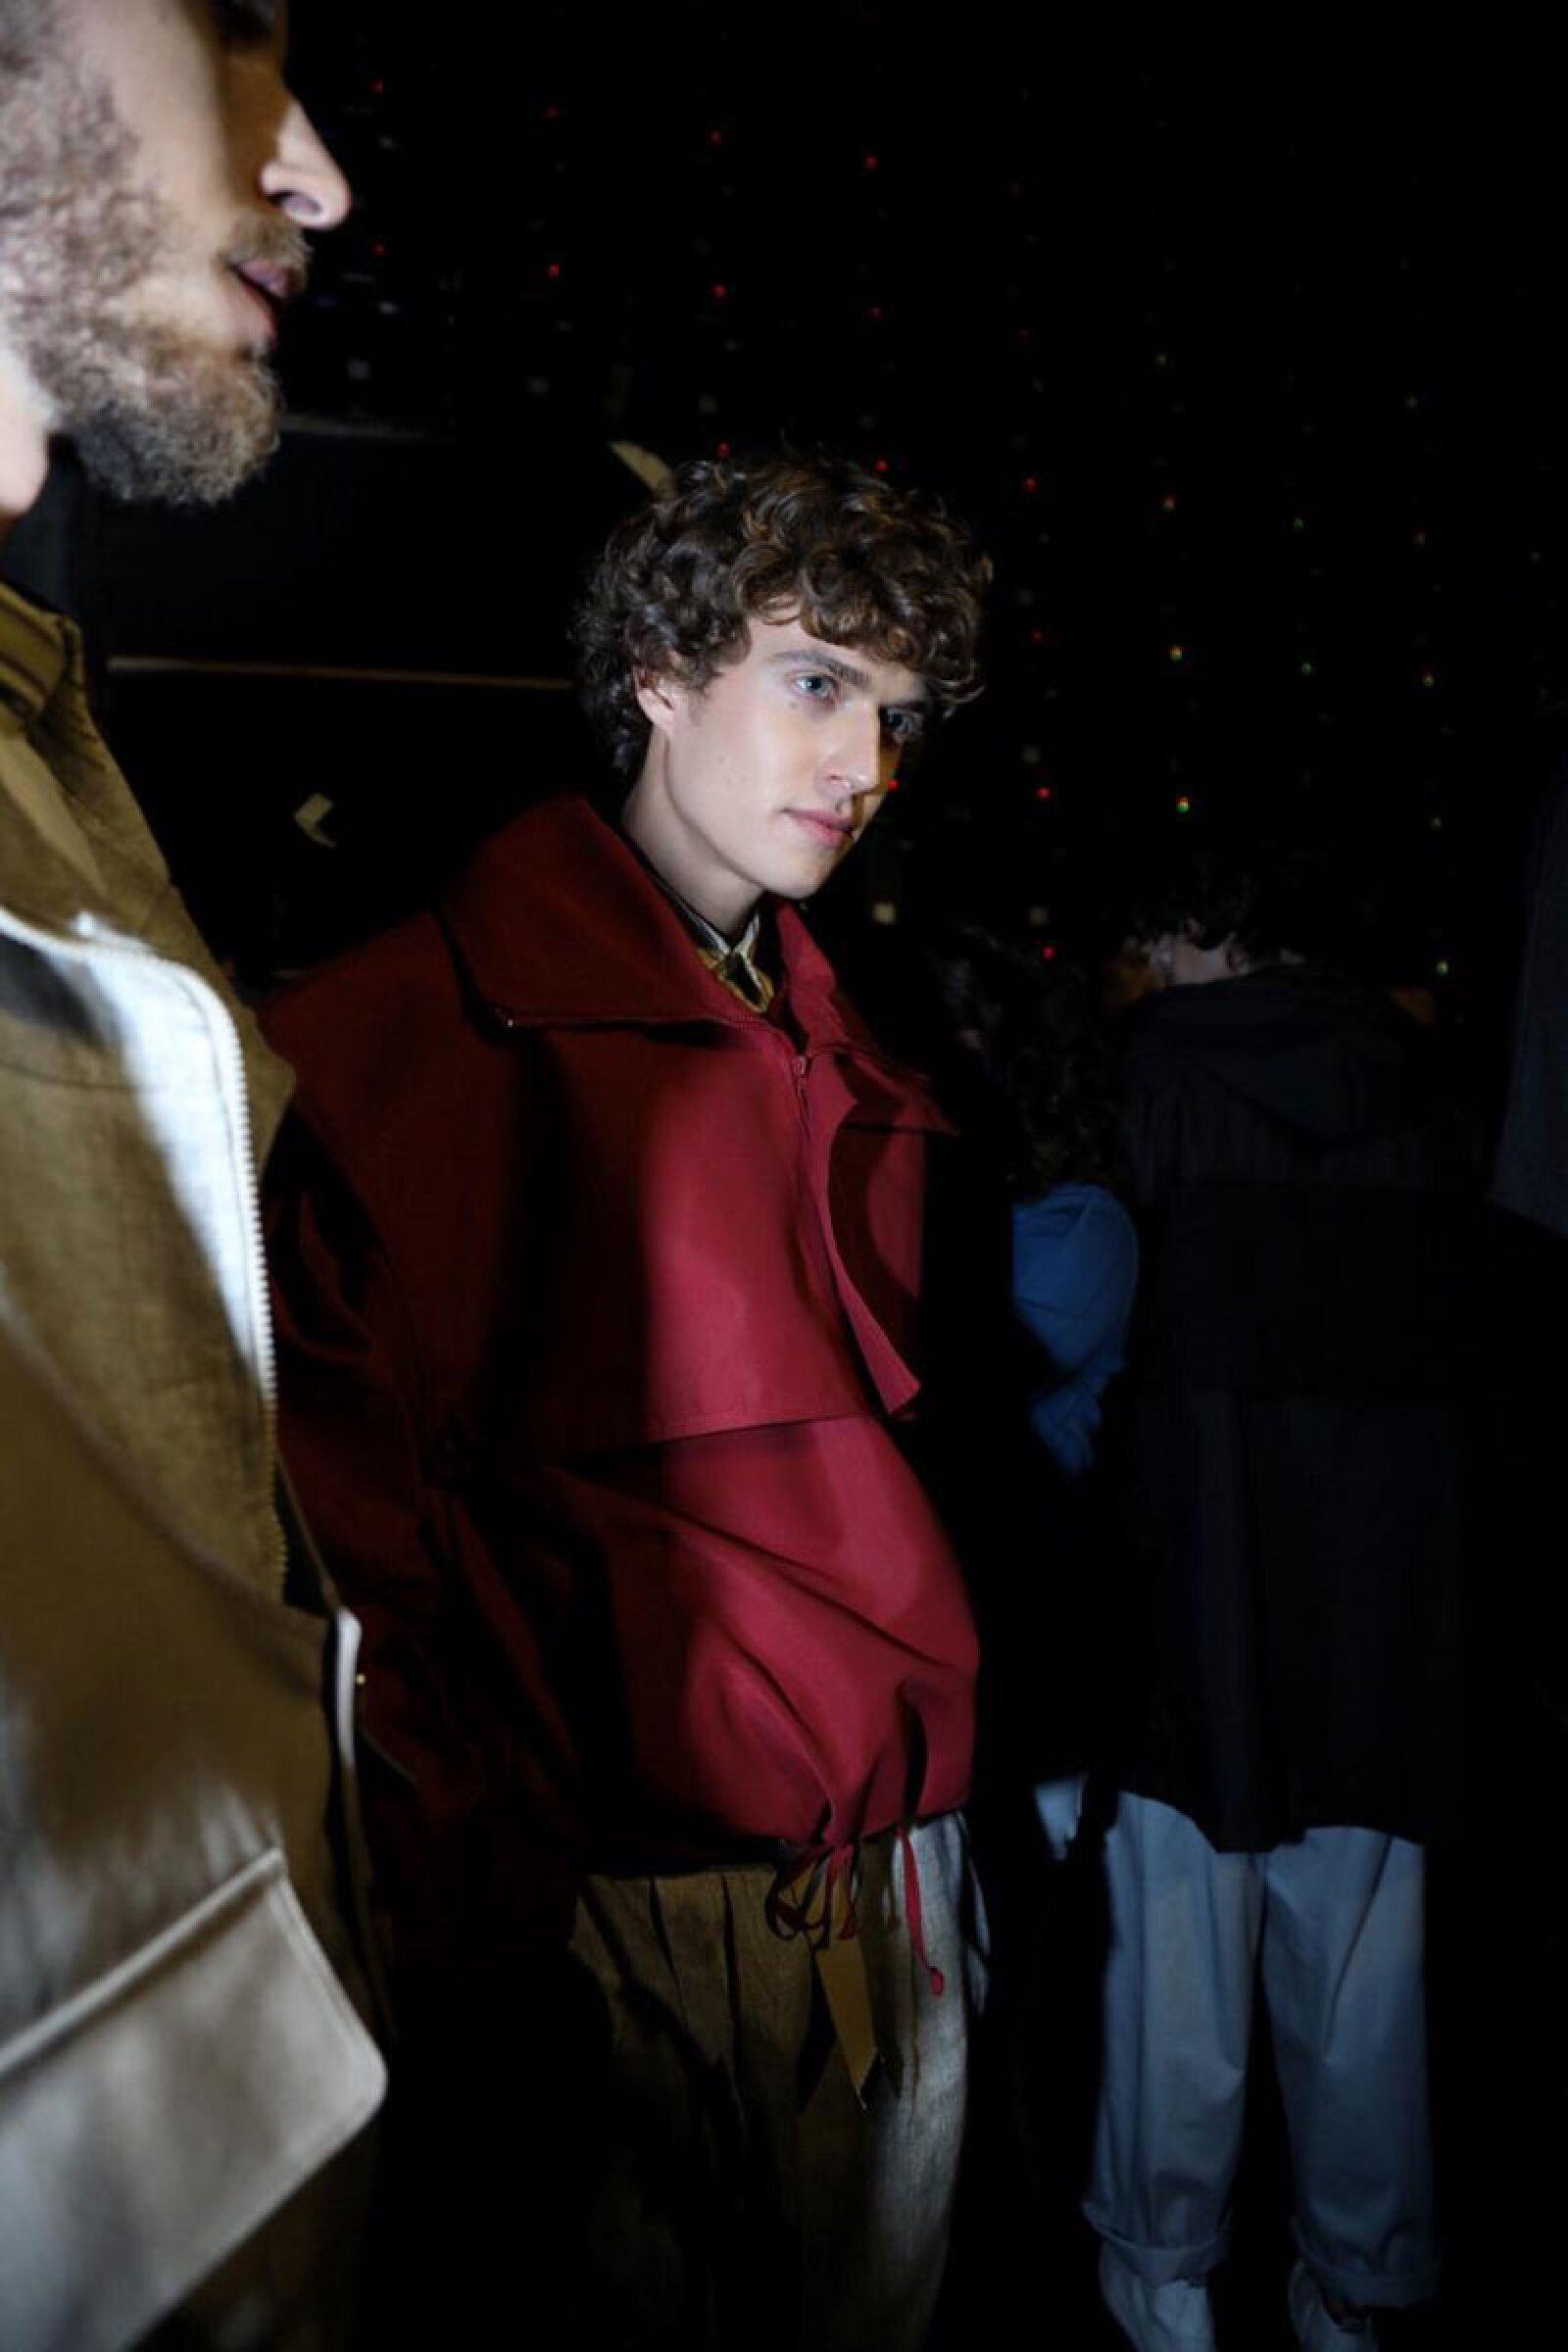 Boyfriends-Shirt-MBFWMx-Red-Jacket-Backstage